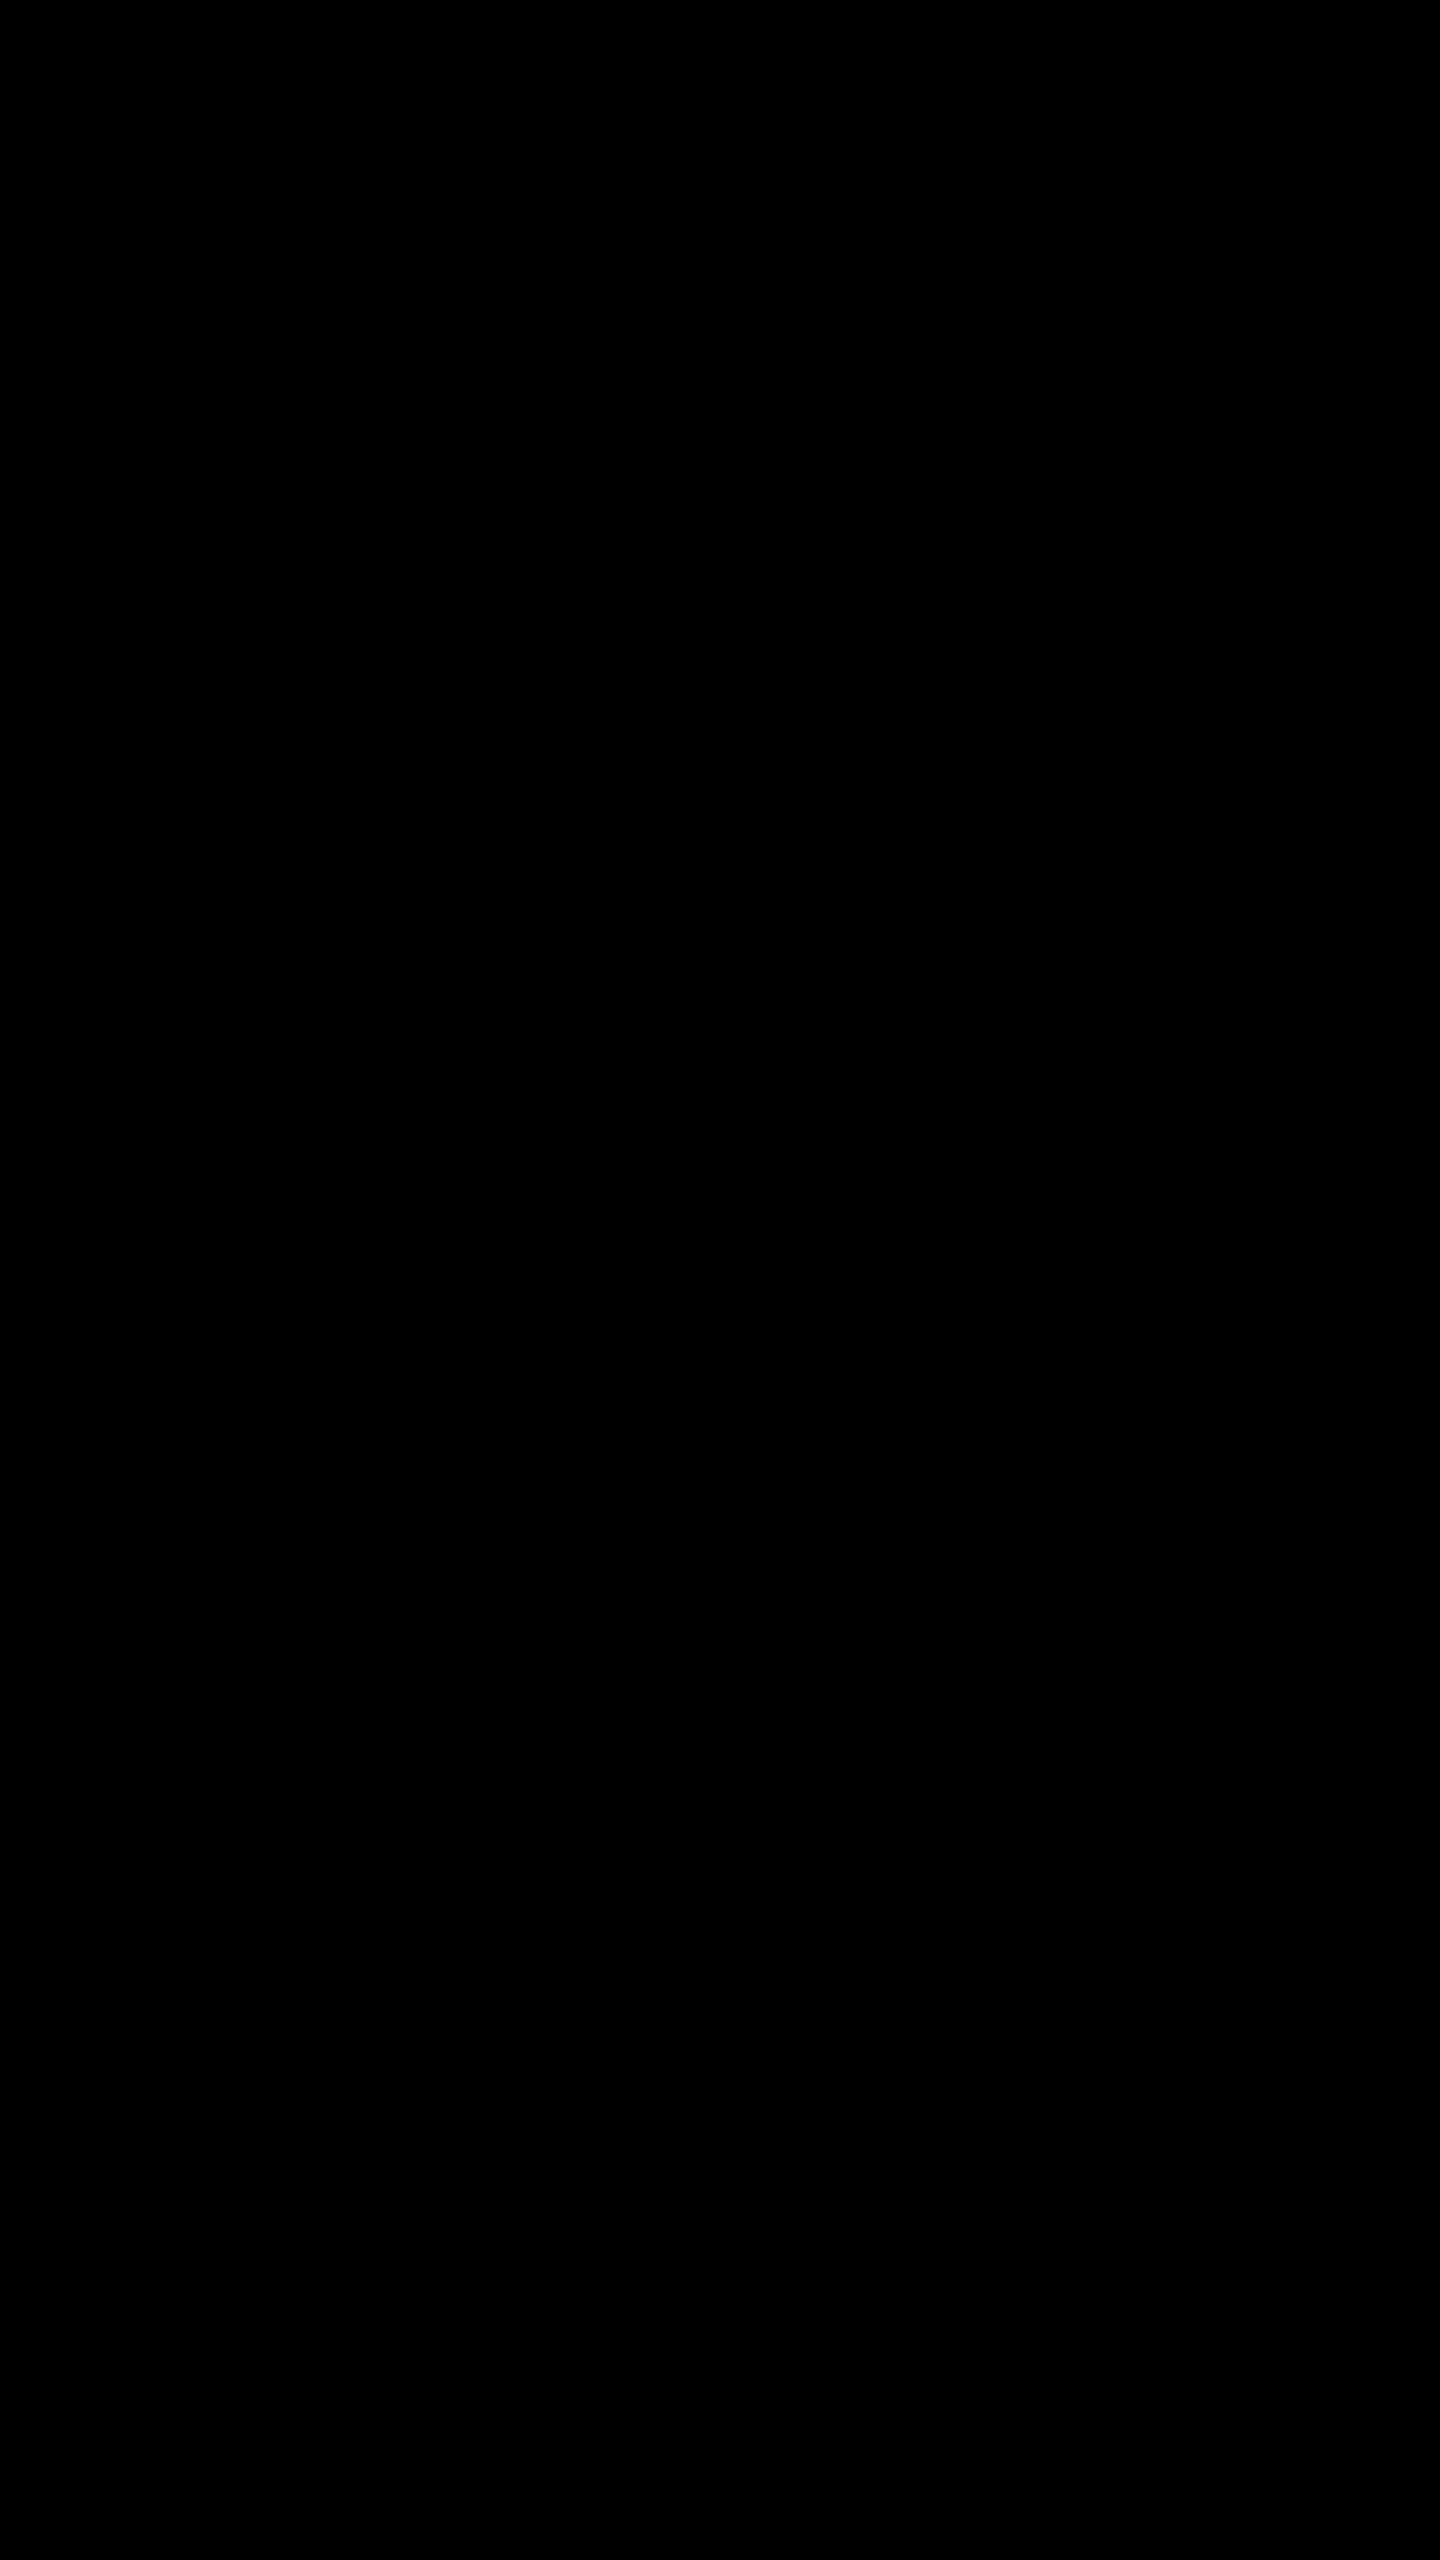 CASTILLA NÚMERO 14